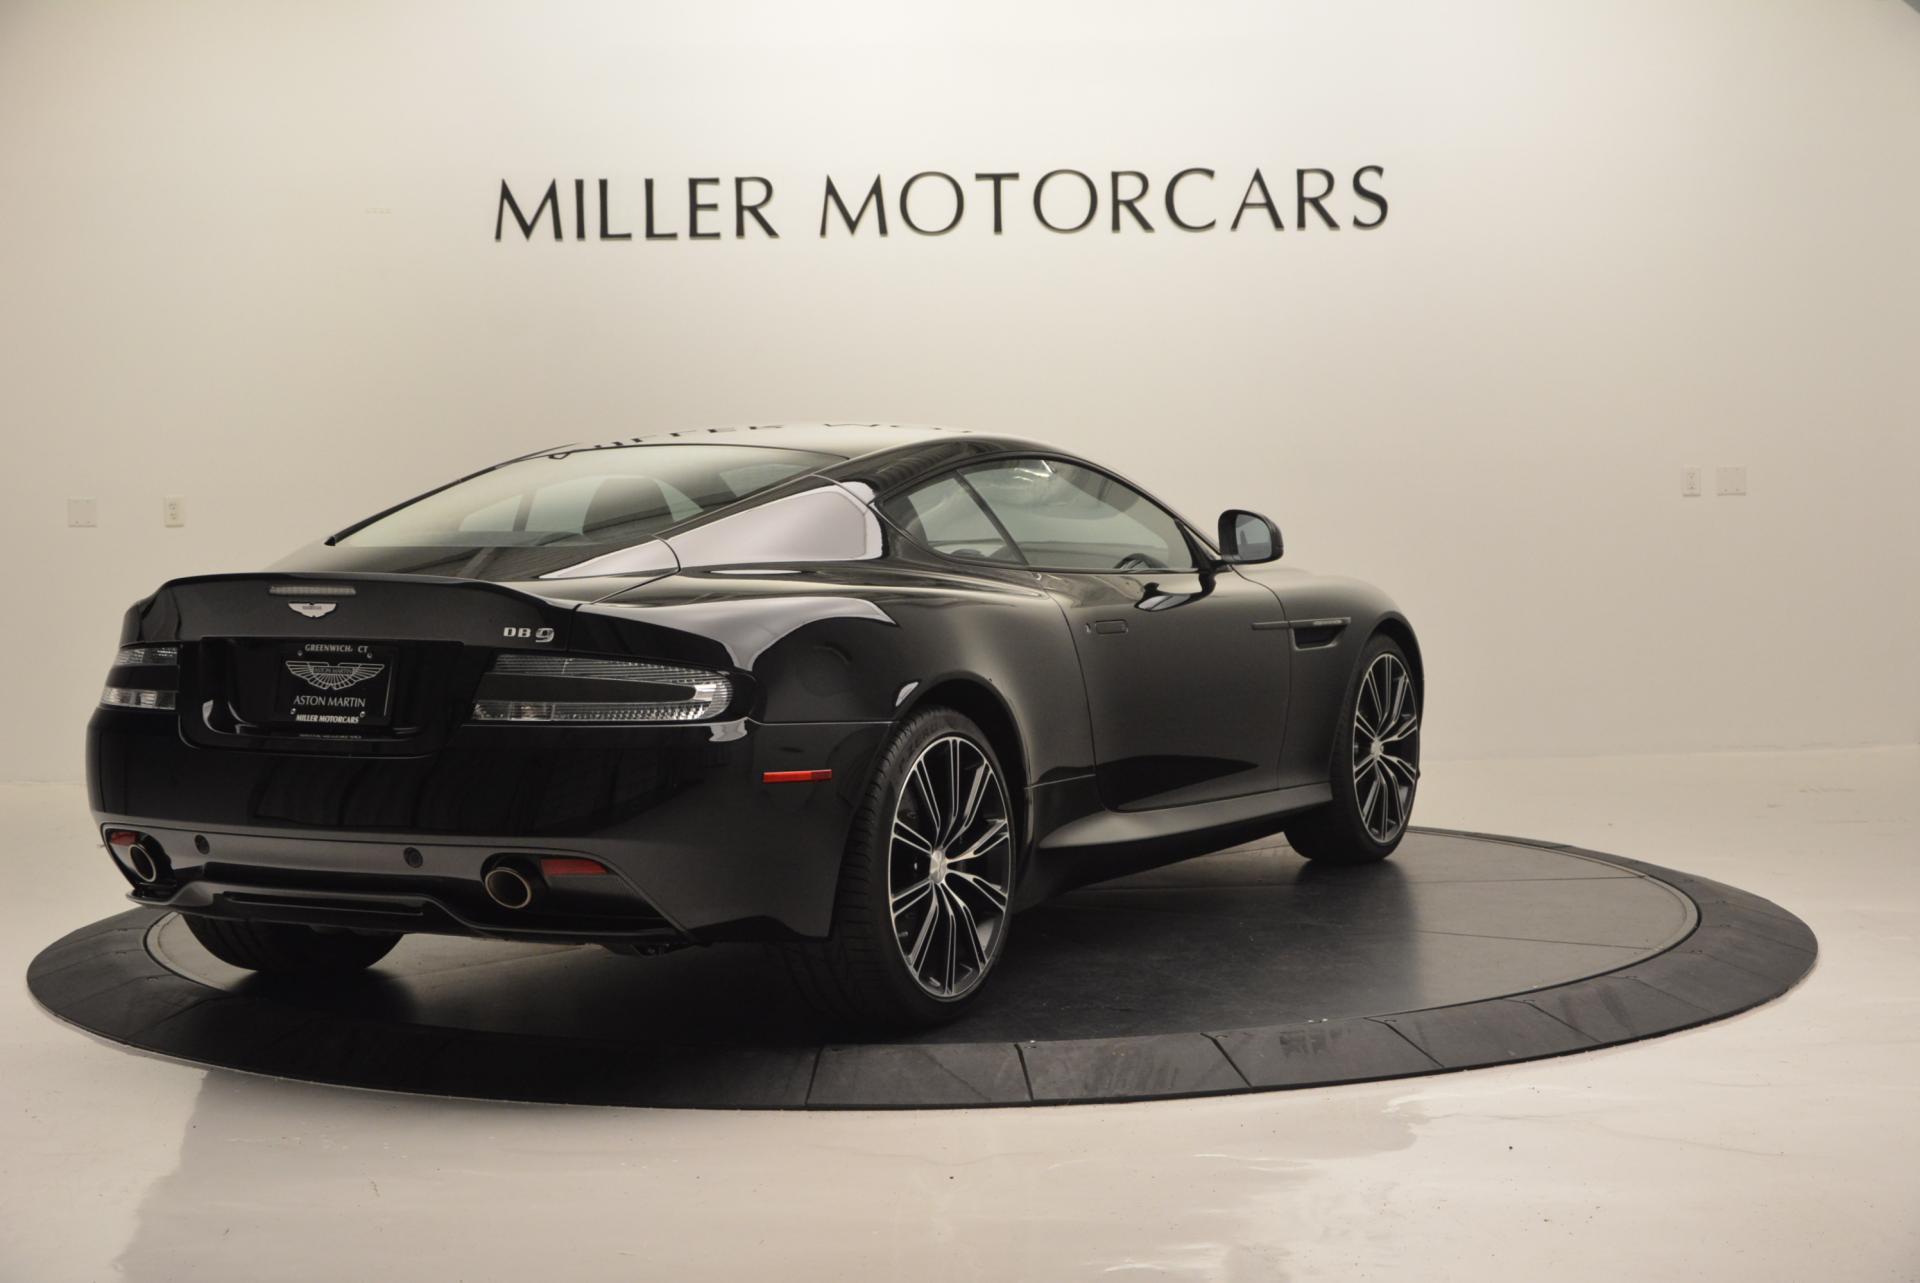 Used 2015 Aston Martin DB9 Carbon Edition For Sale In Greenwich, CT. Alfa Romeo of Greenwich, 7349 528_p7